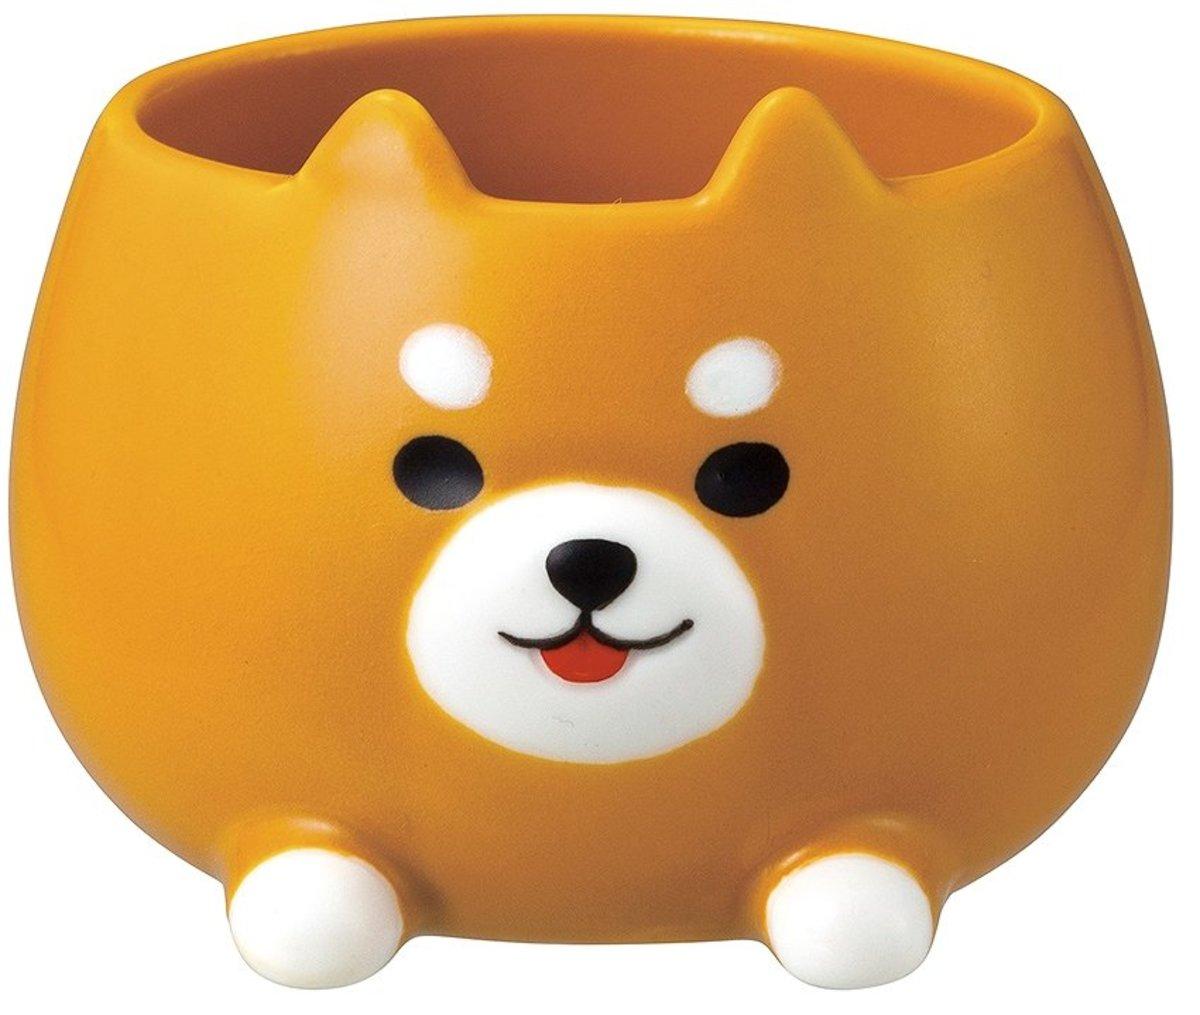 Insect repellent animal cup set Shibiki SK-59206 -  Shiba Inu